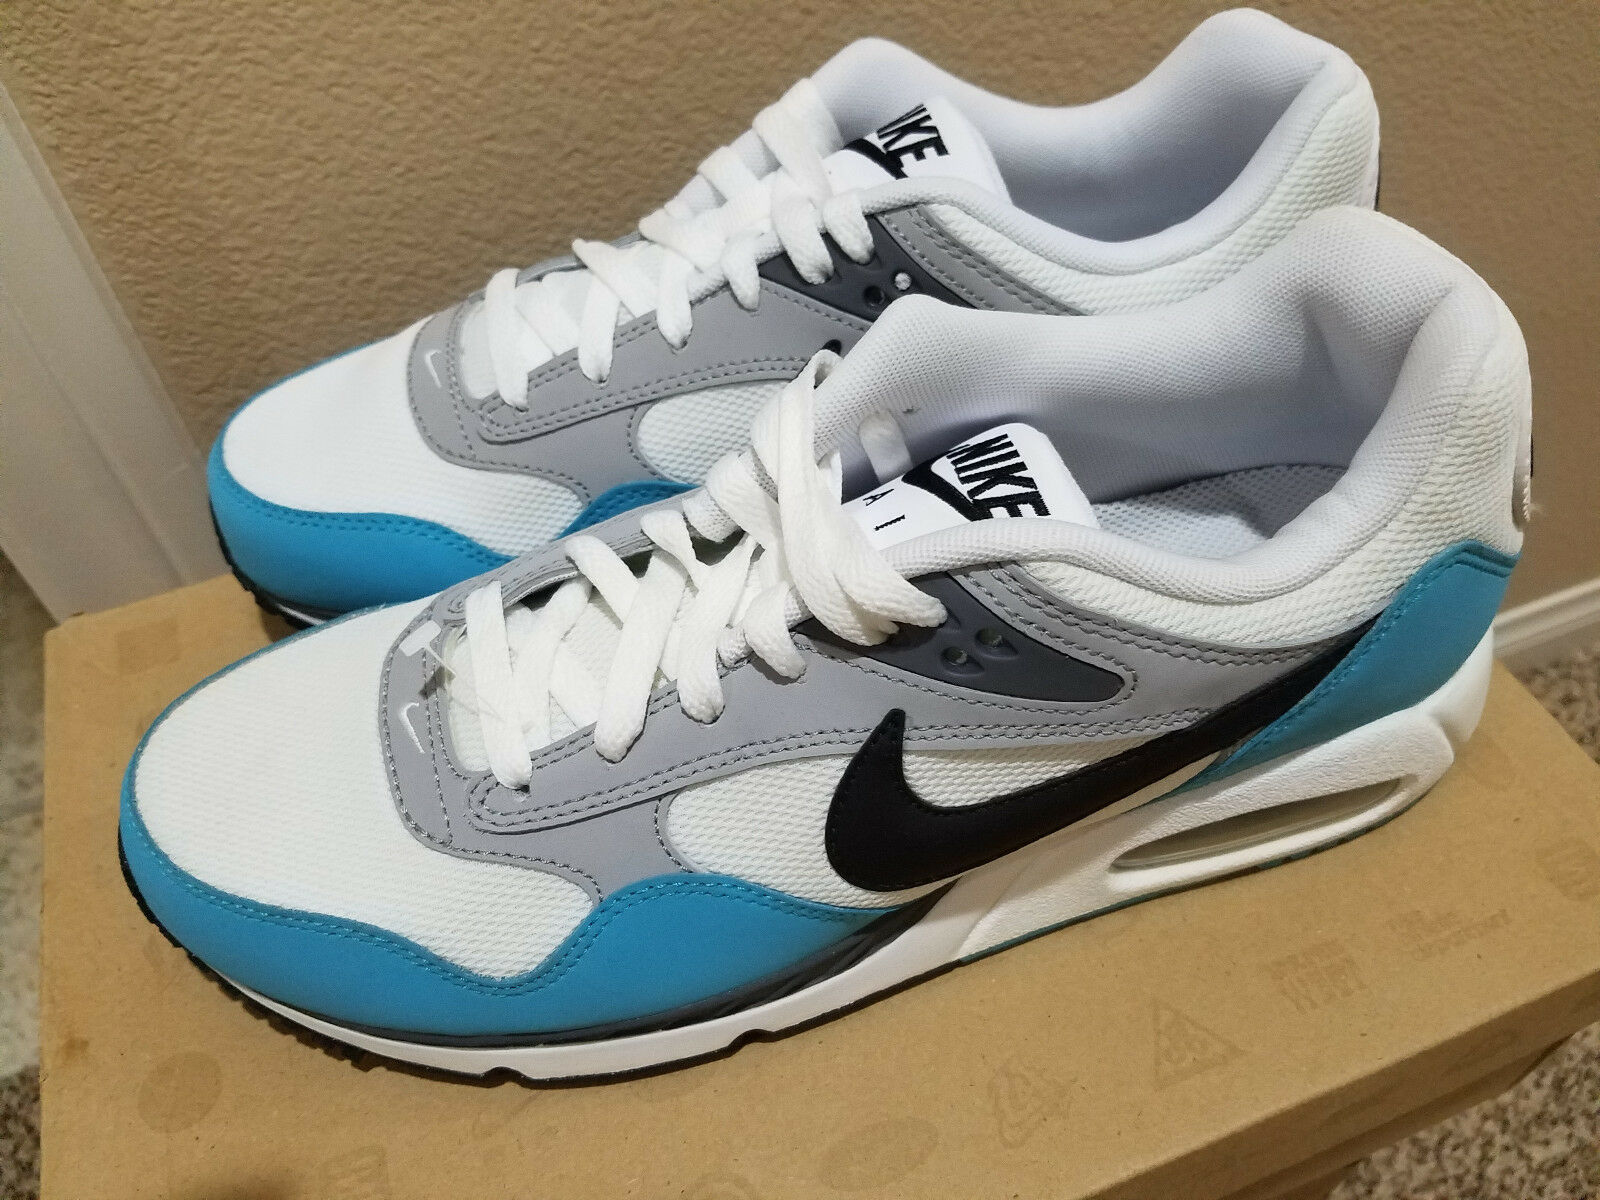 New Nike Air Max Sunrise White Black Turquoise 511417 142 Women's 11 Men's 9.5